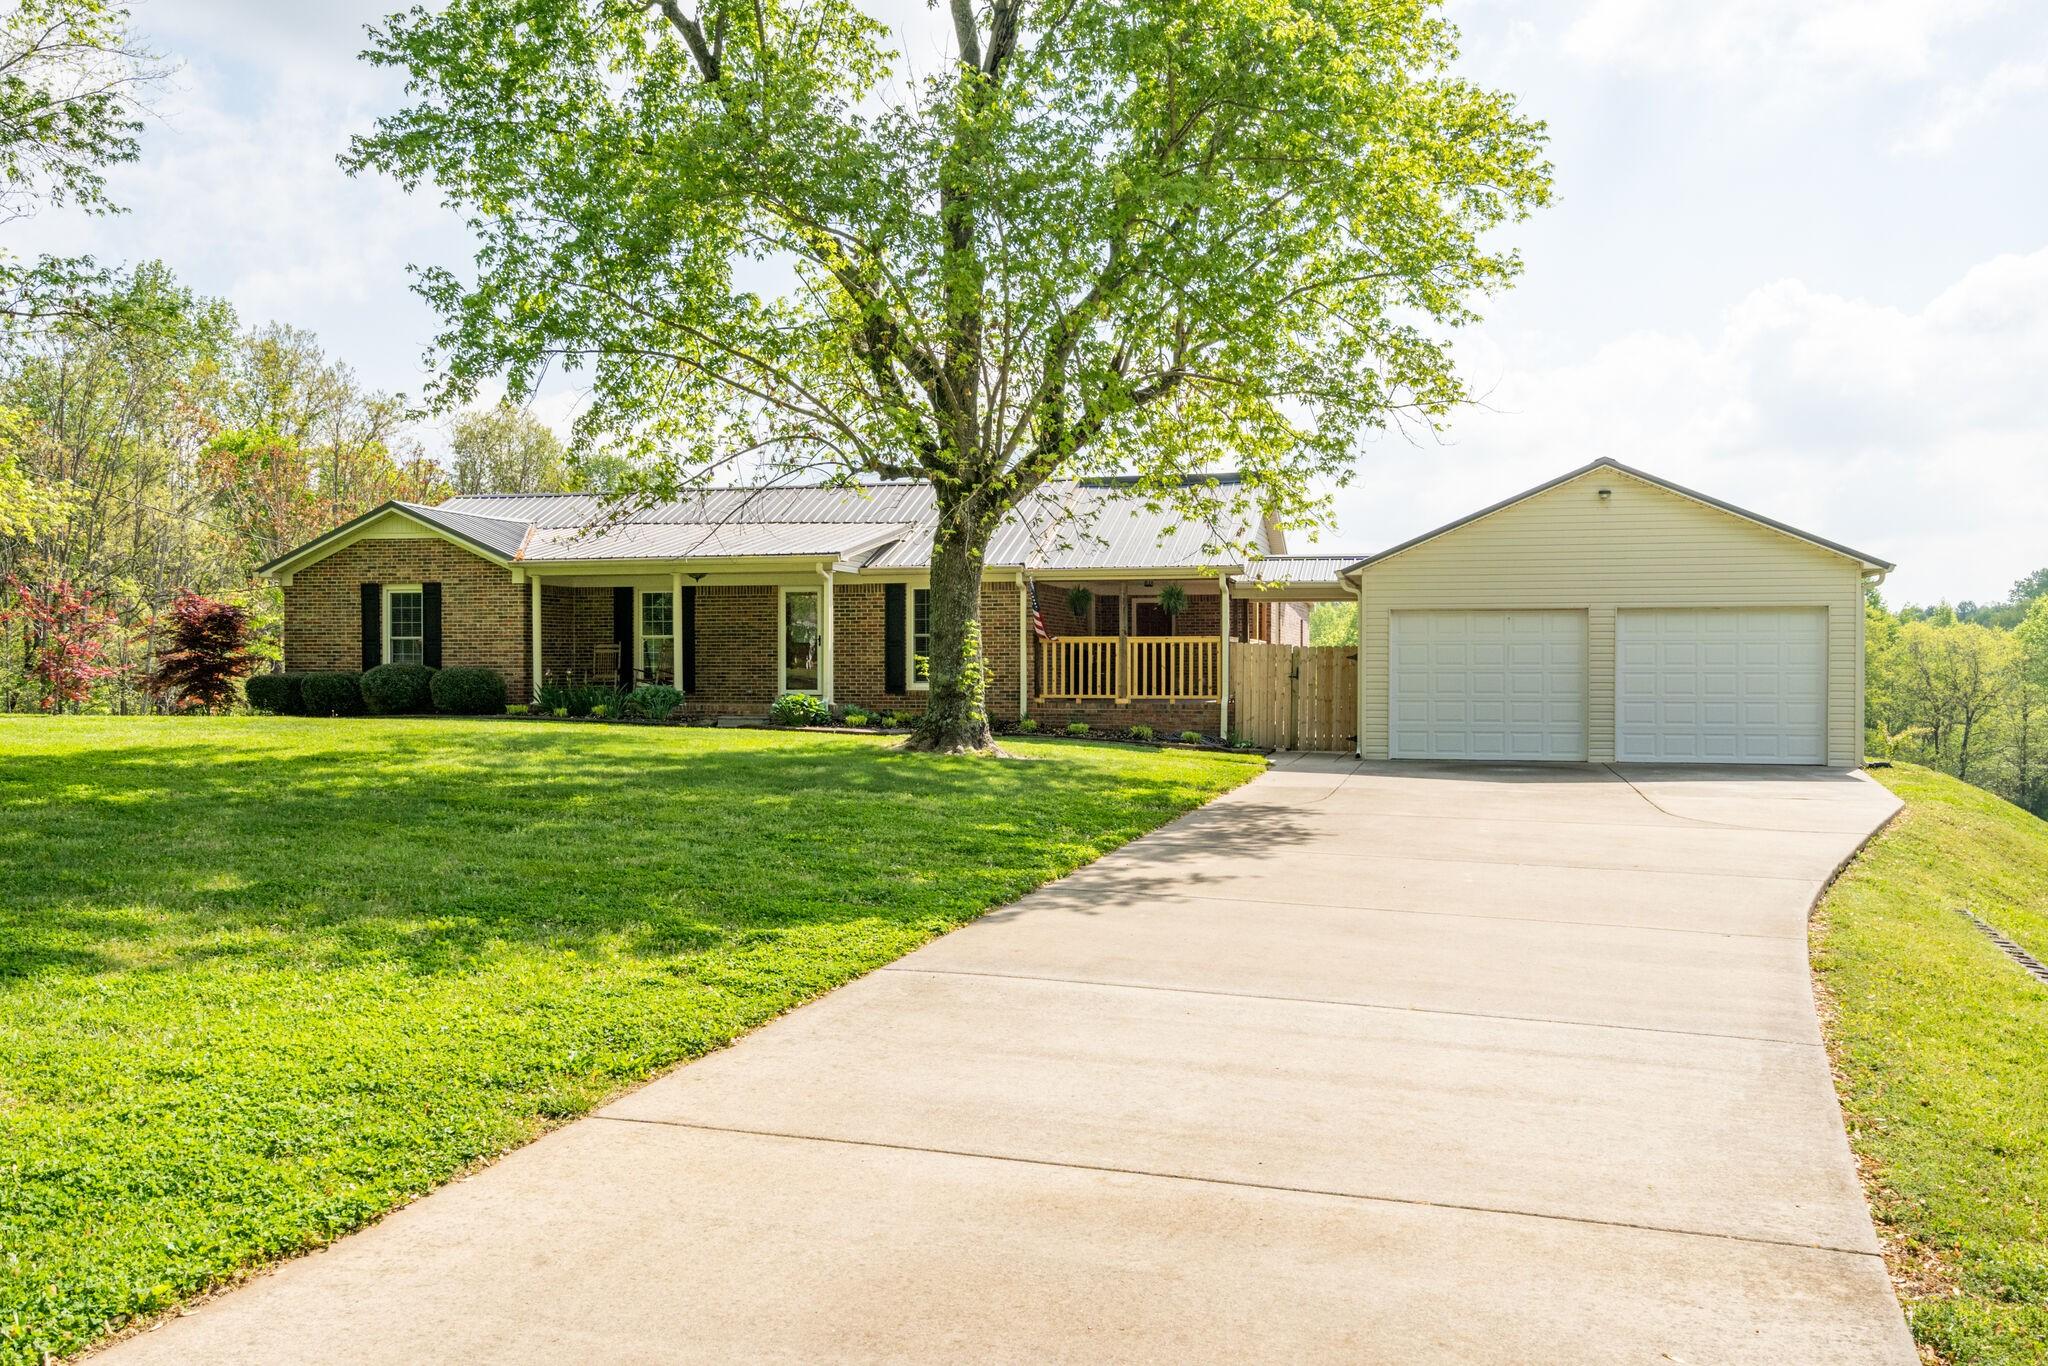 3284 Fly Rd Property Photo - Santa Fe, TN real estate listing